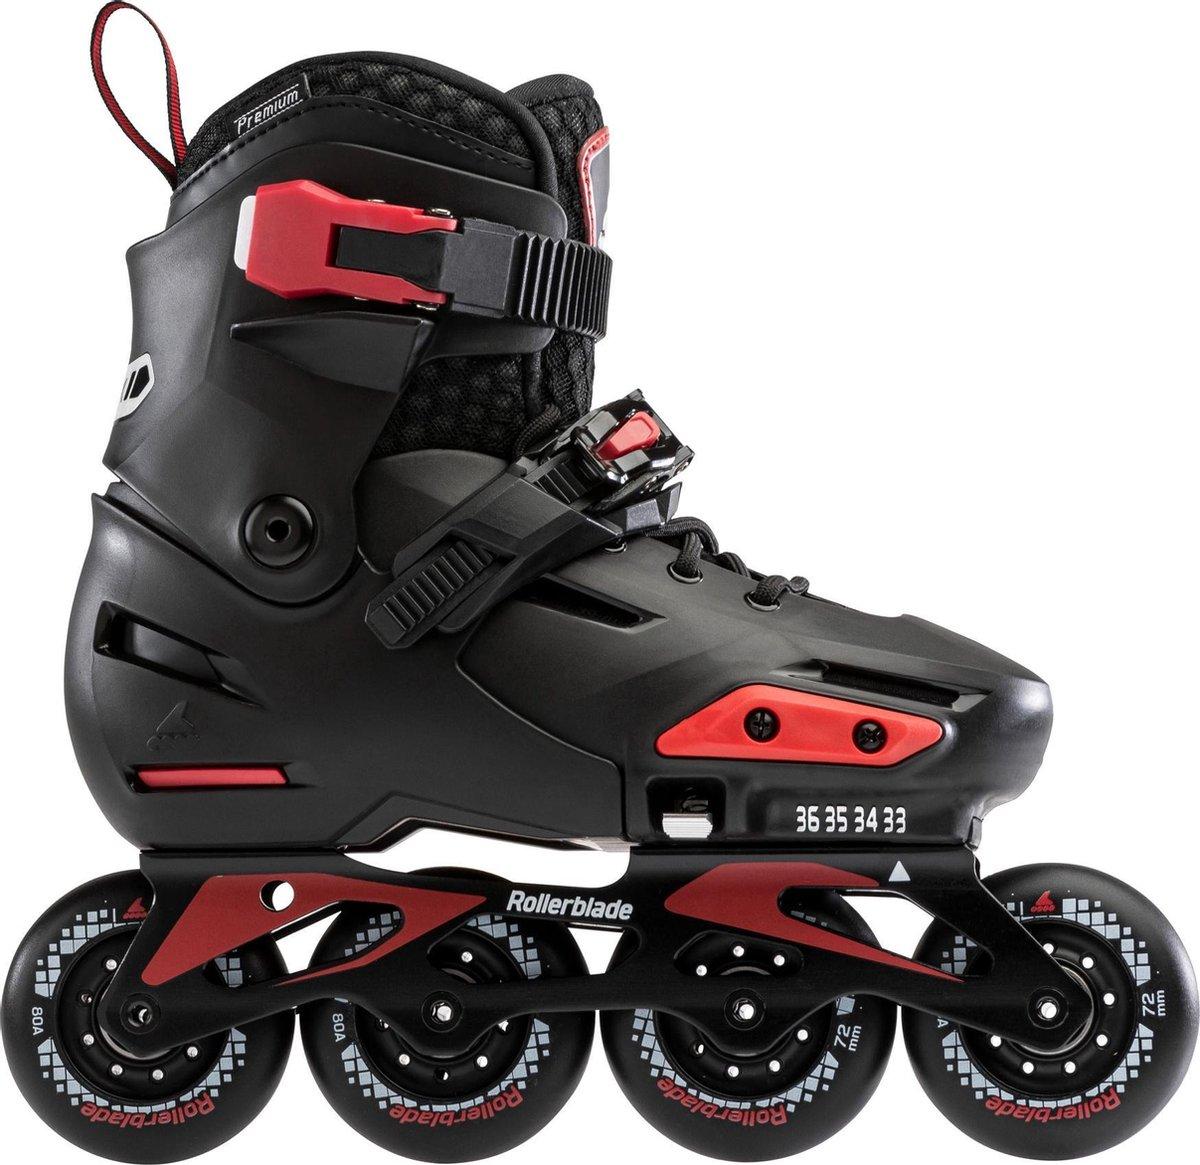 Rollerblade Inlineskates - Maat 37-40 - Unisex - zwart/rood